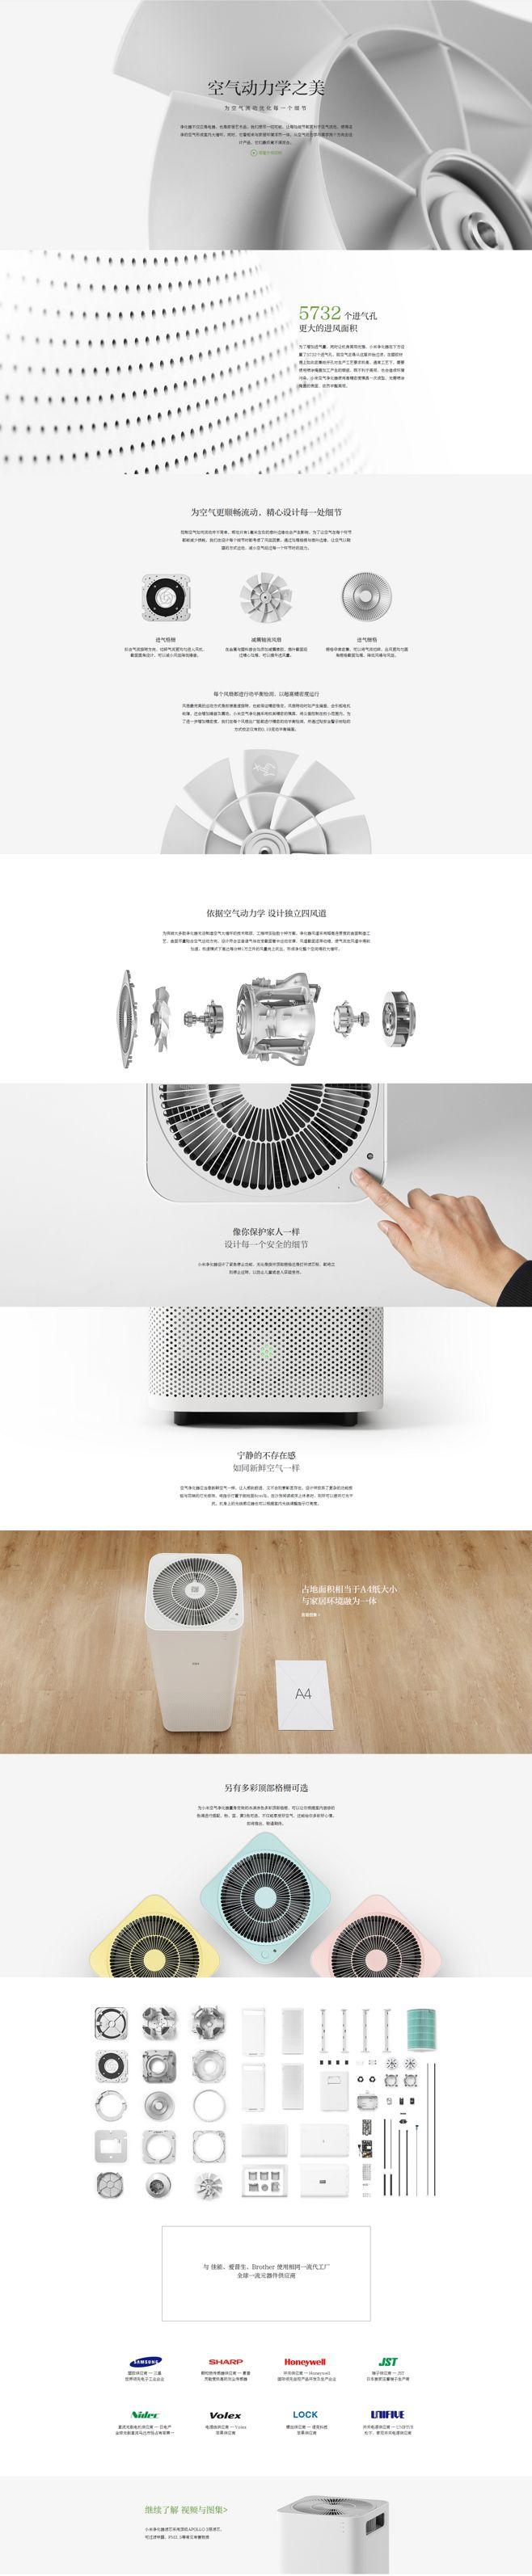 #WebDesignInspirarion - beautiful grayscale webdesign